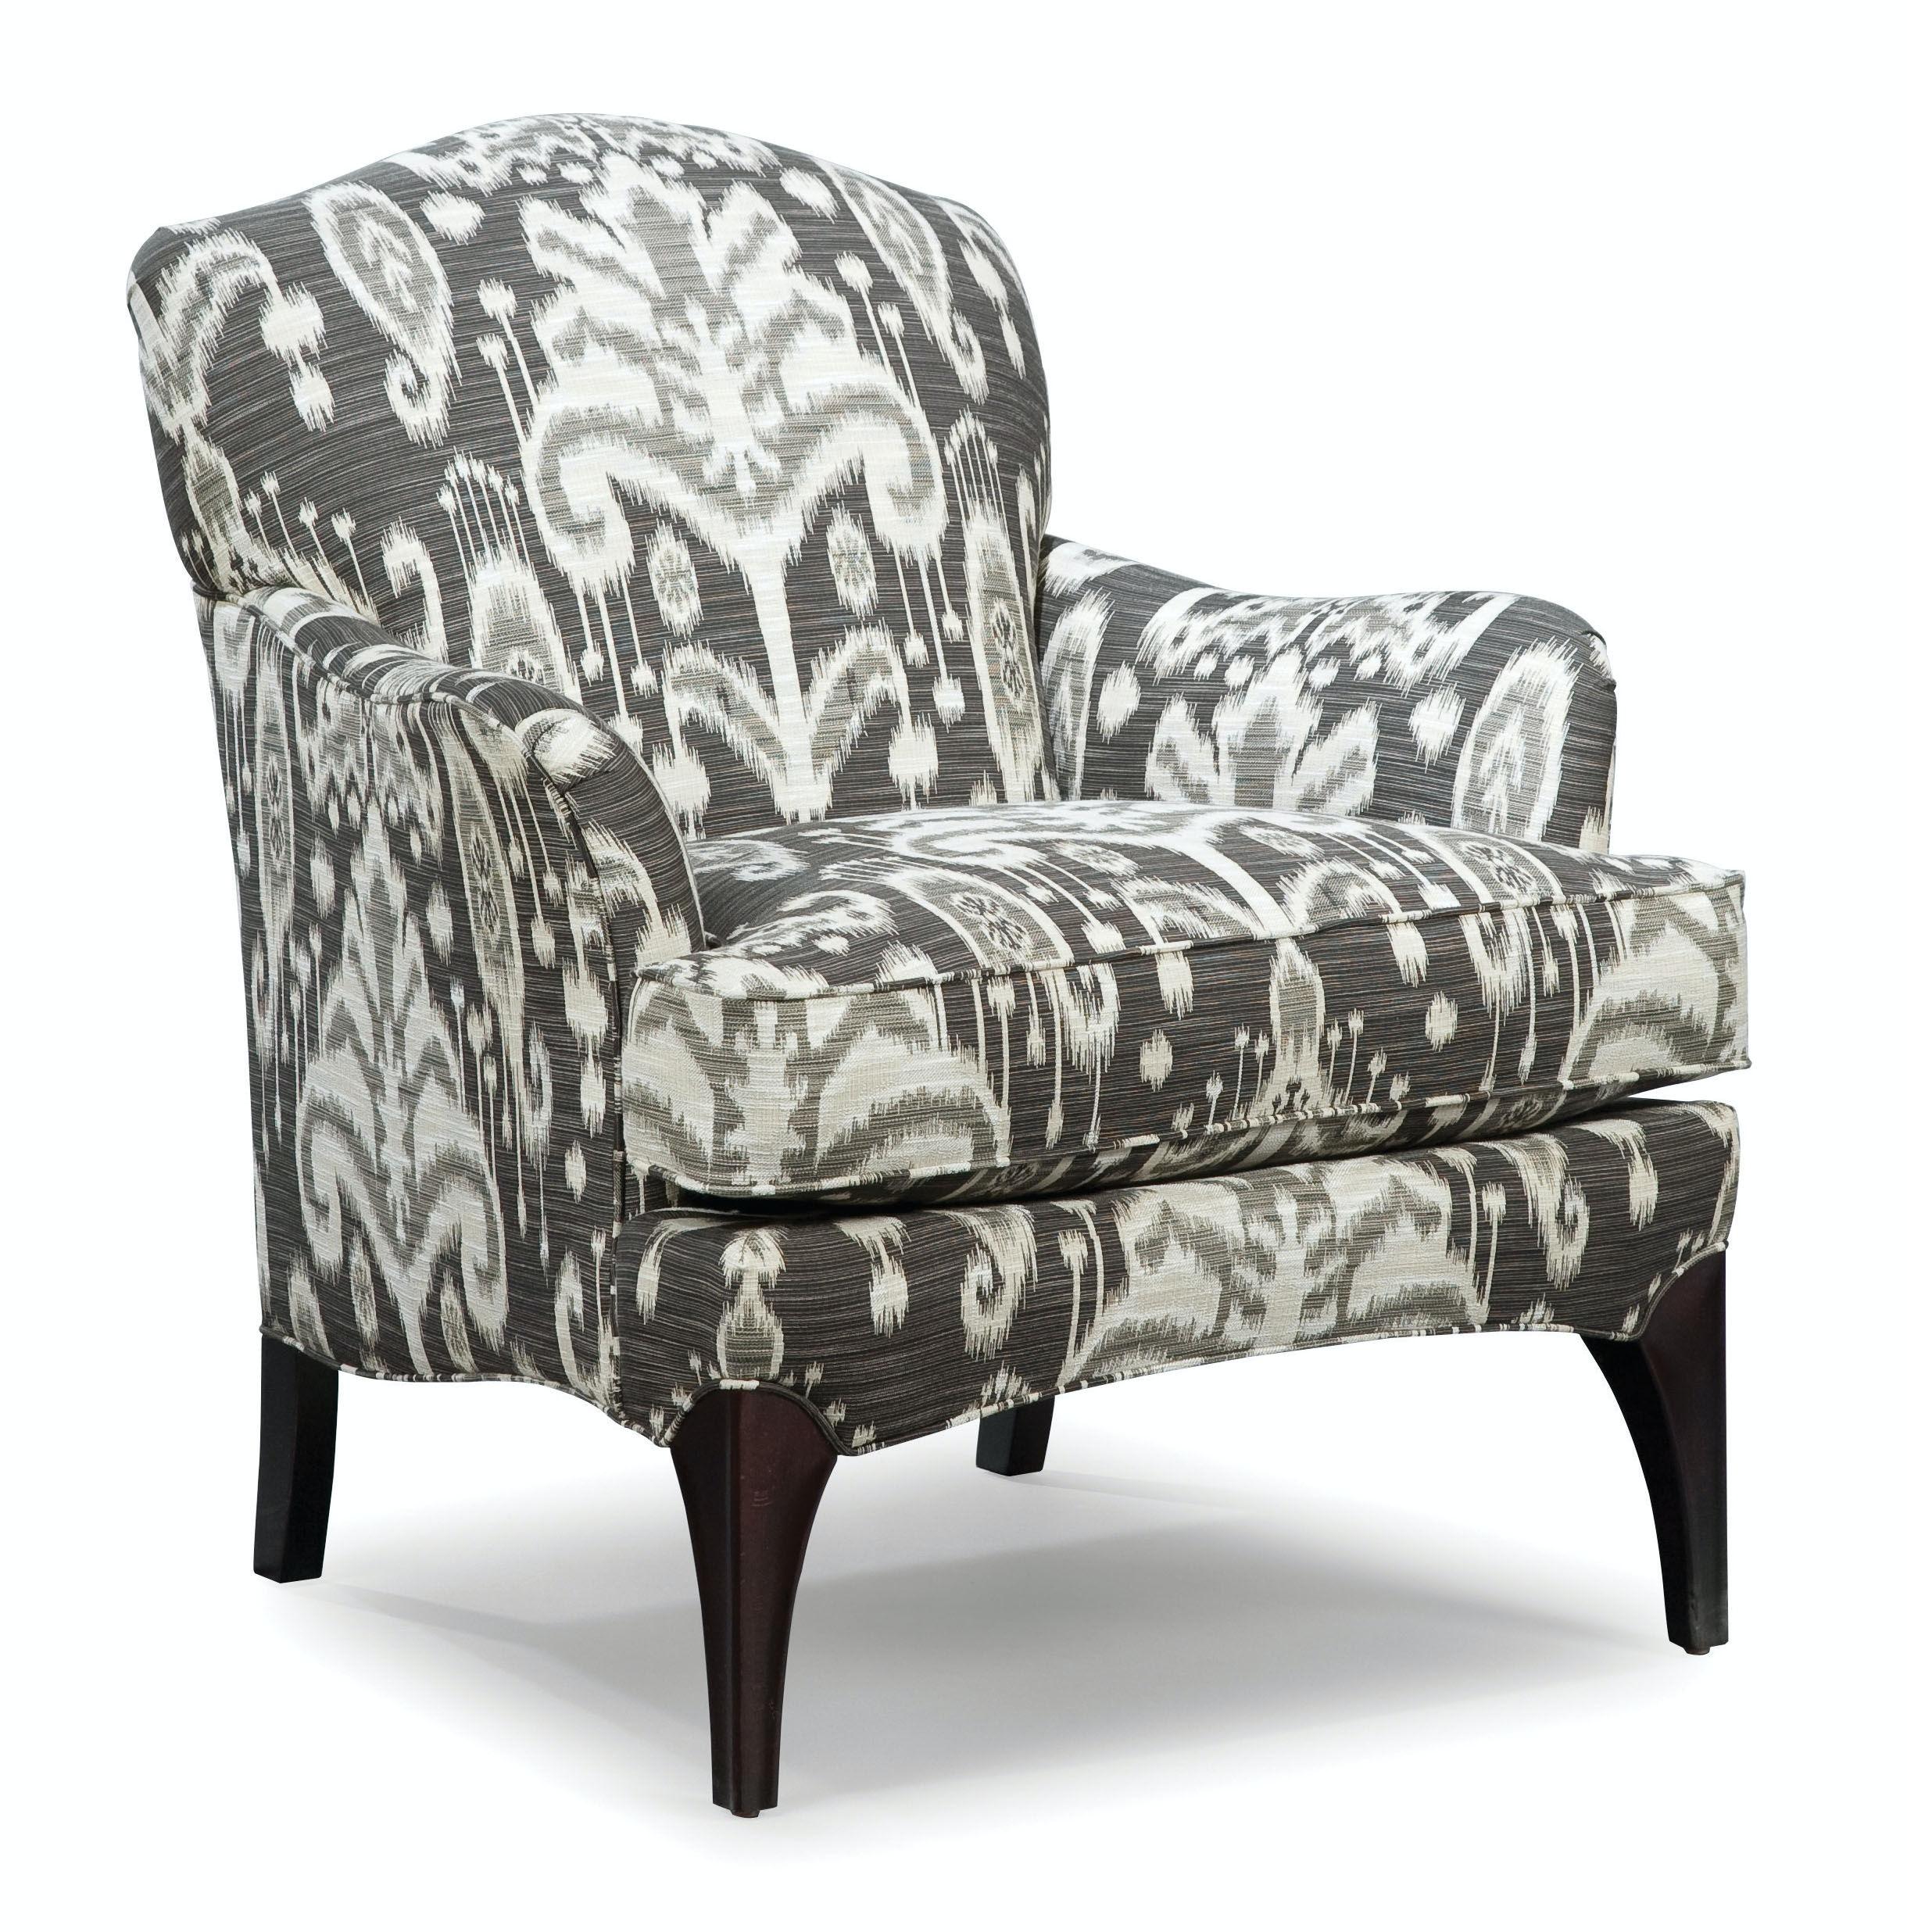 Ordinaire Fairfield Chair Company Mathis Lounge Chair 5729 01